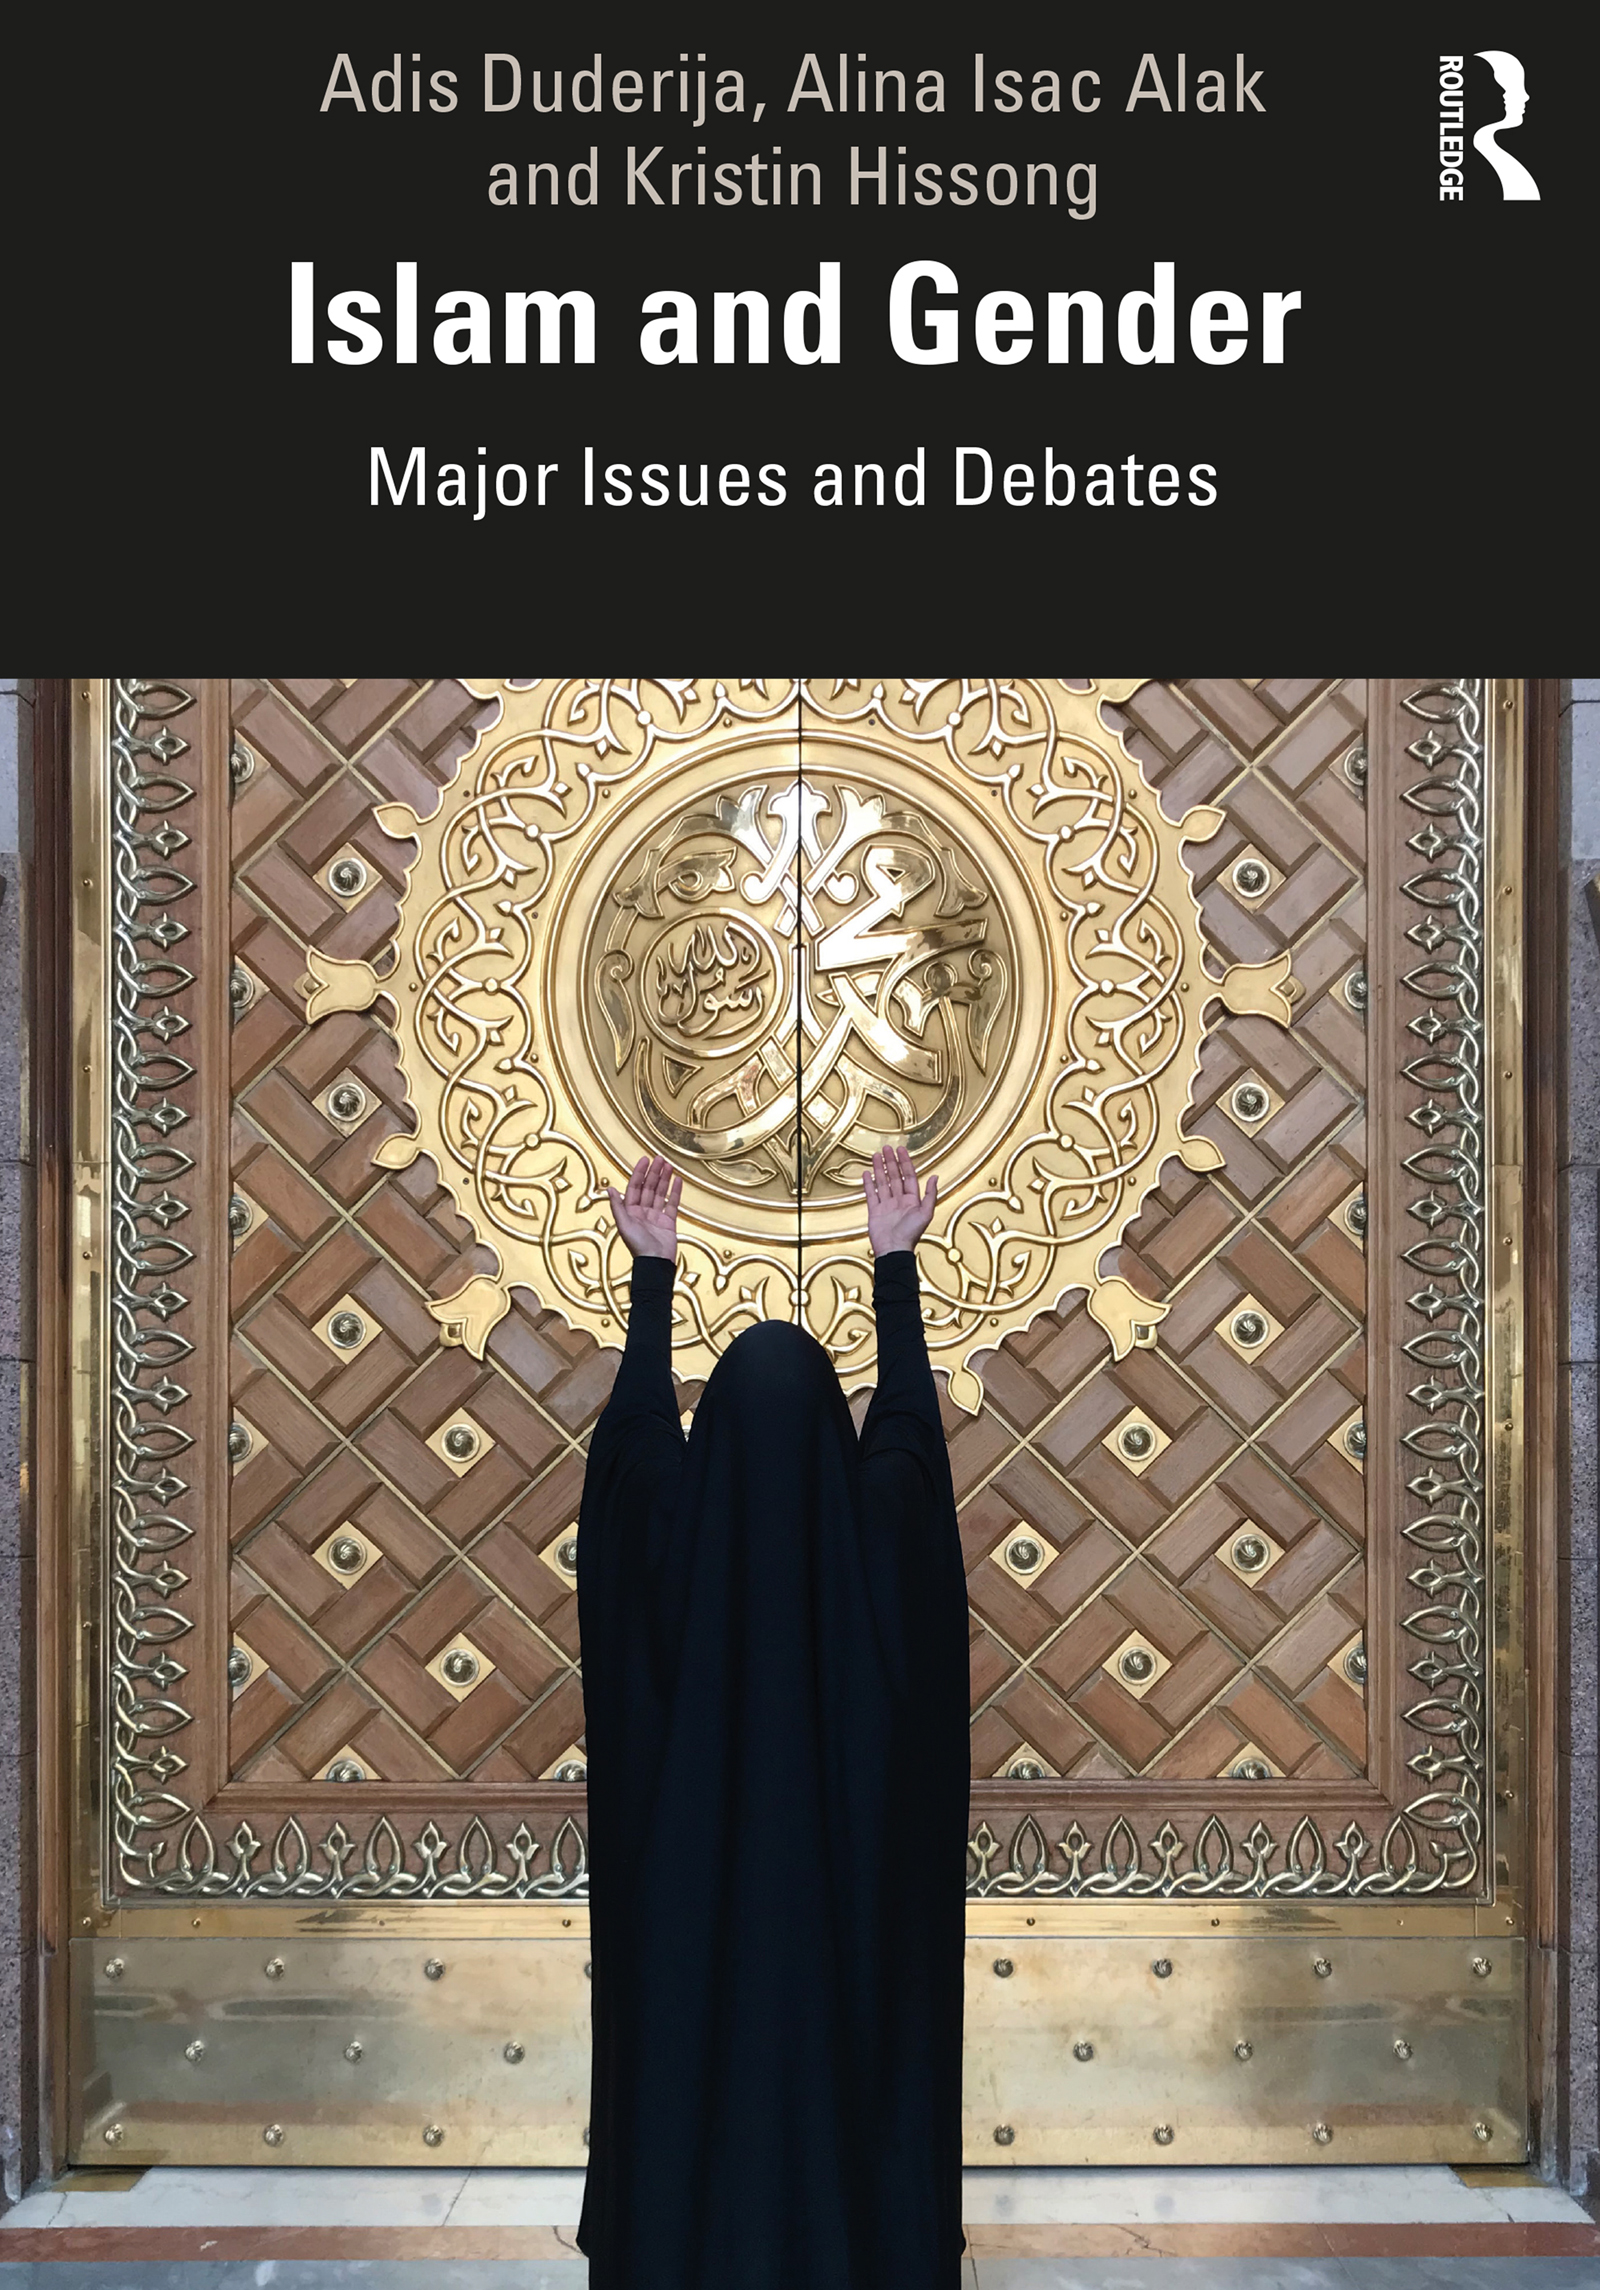 Masculinity and femininity in the premodern Islamic interpretative tradition